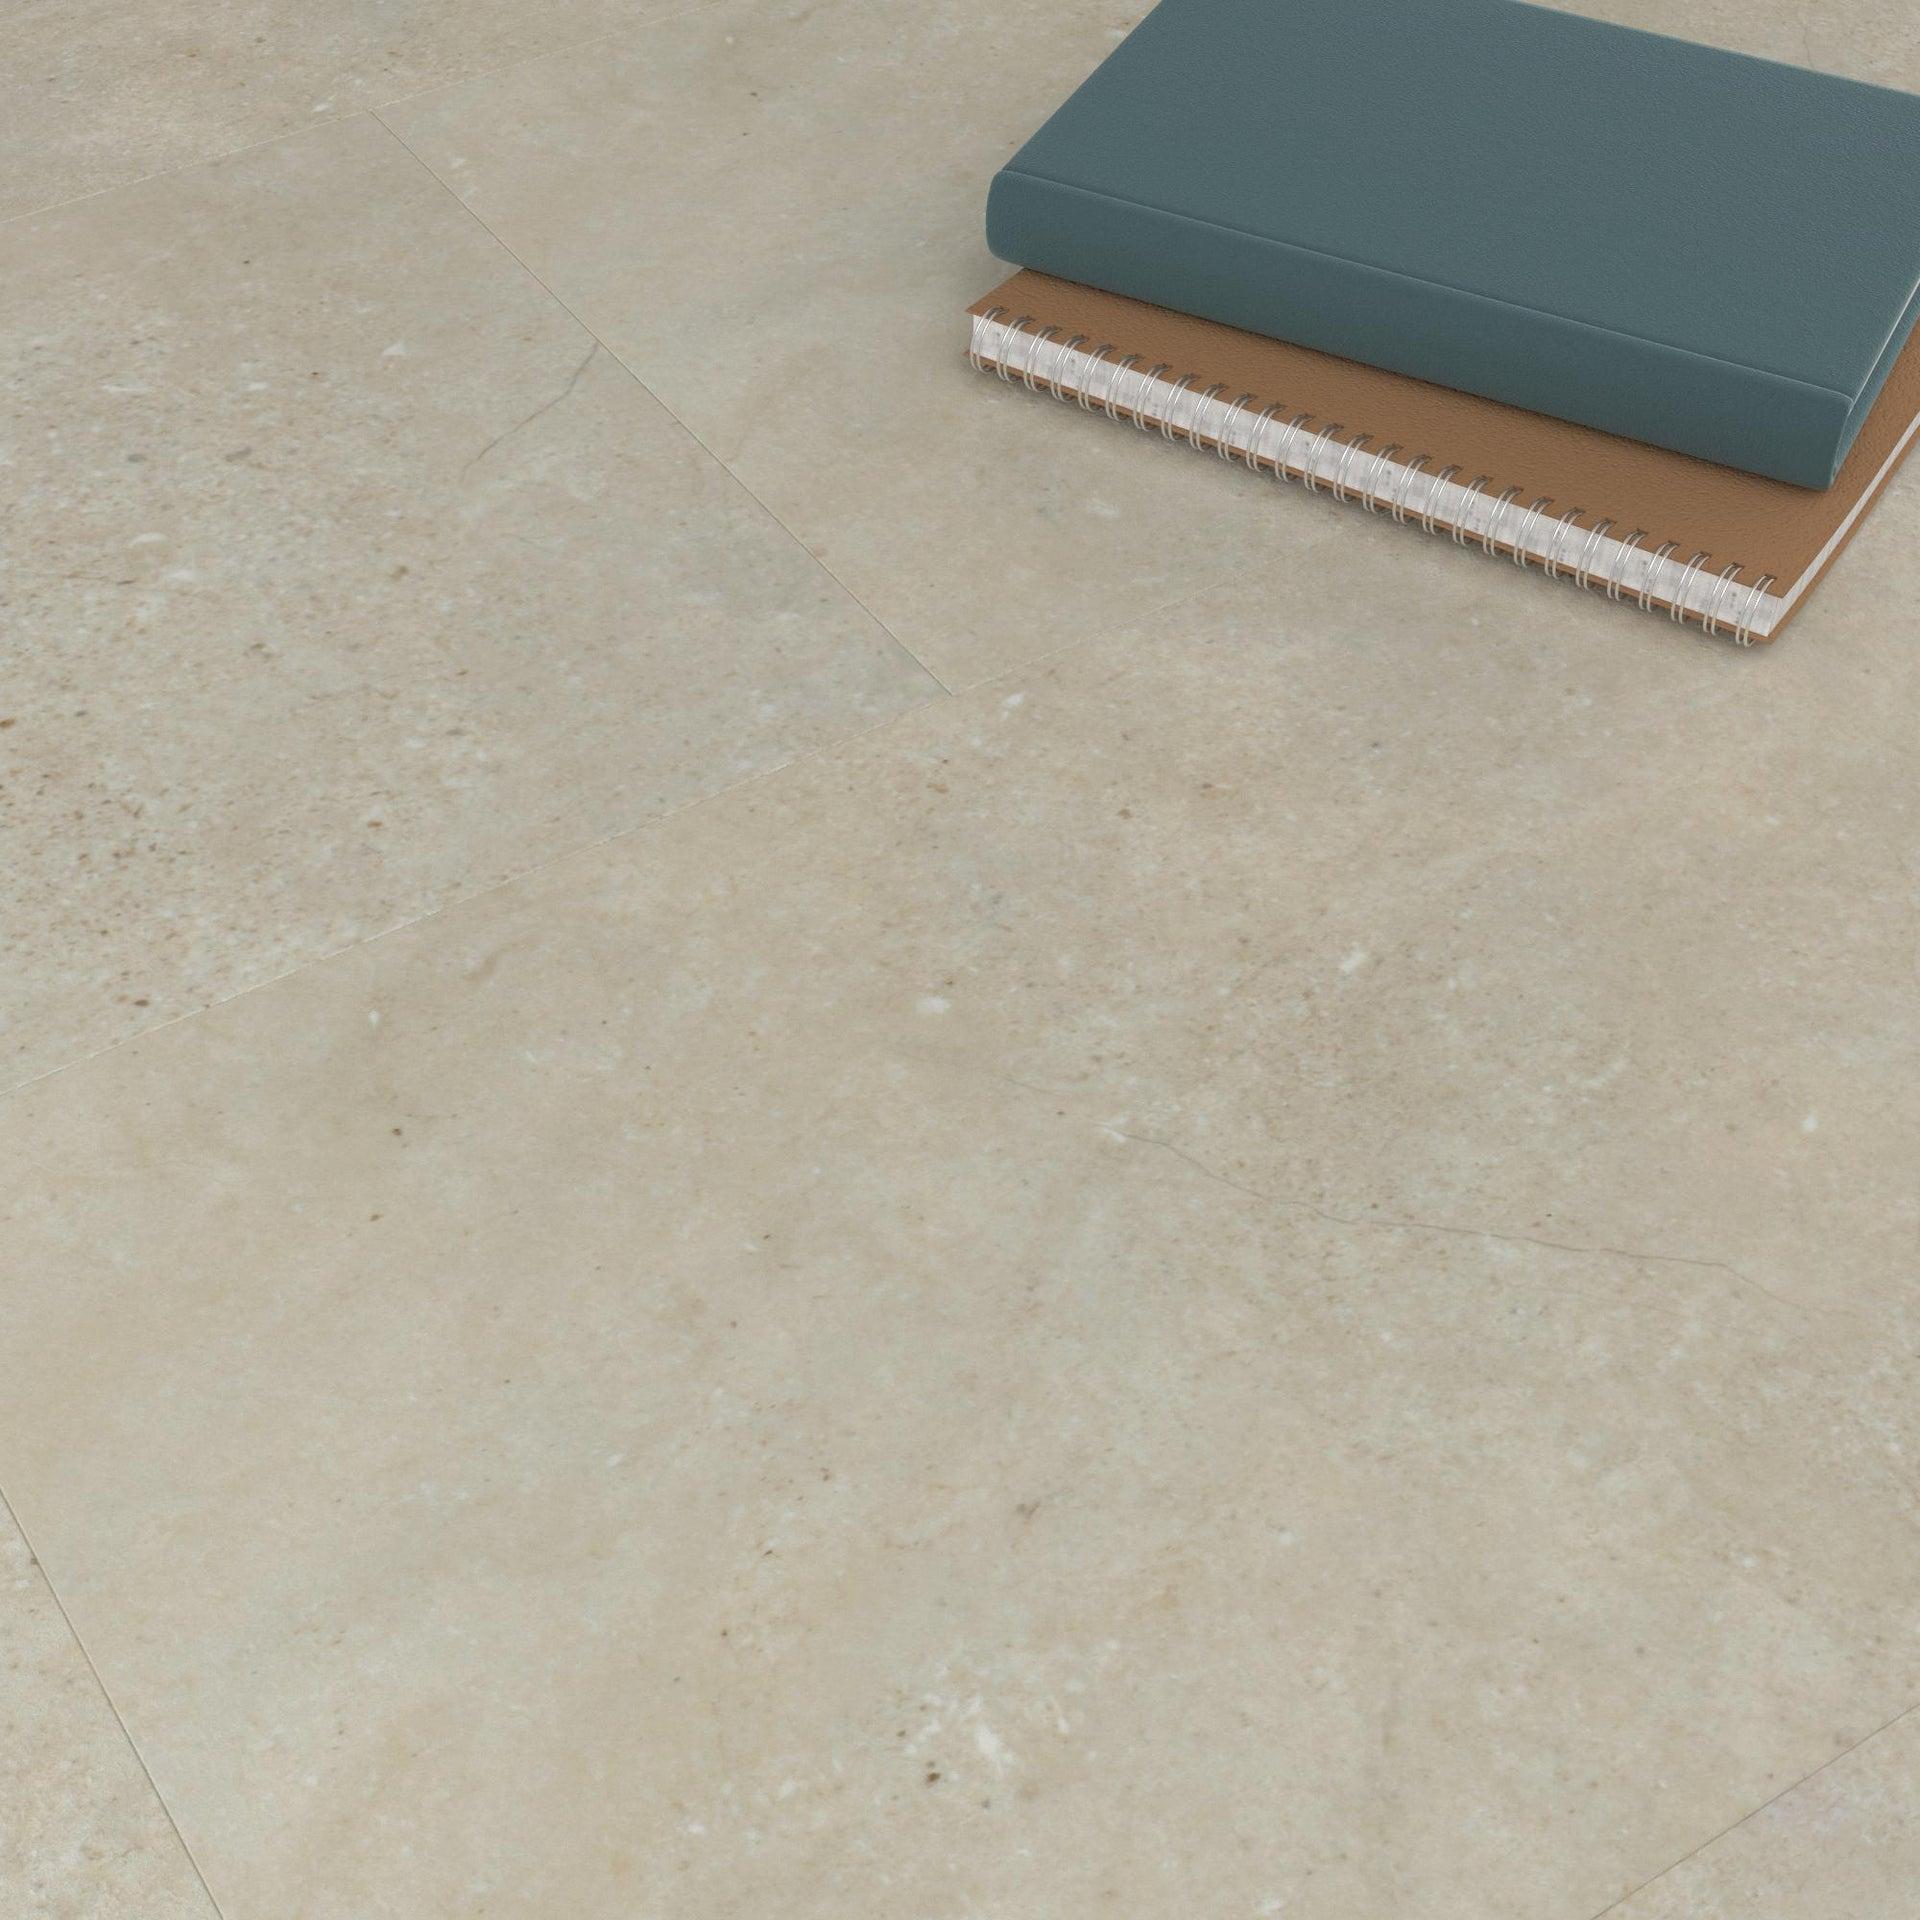 Pavimento PVC adesivo Limestone Sp 2 mm grigio / argento - 10